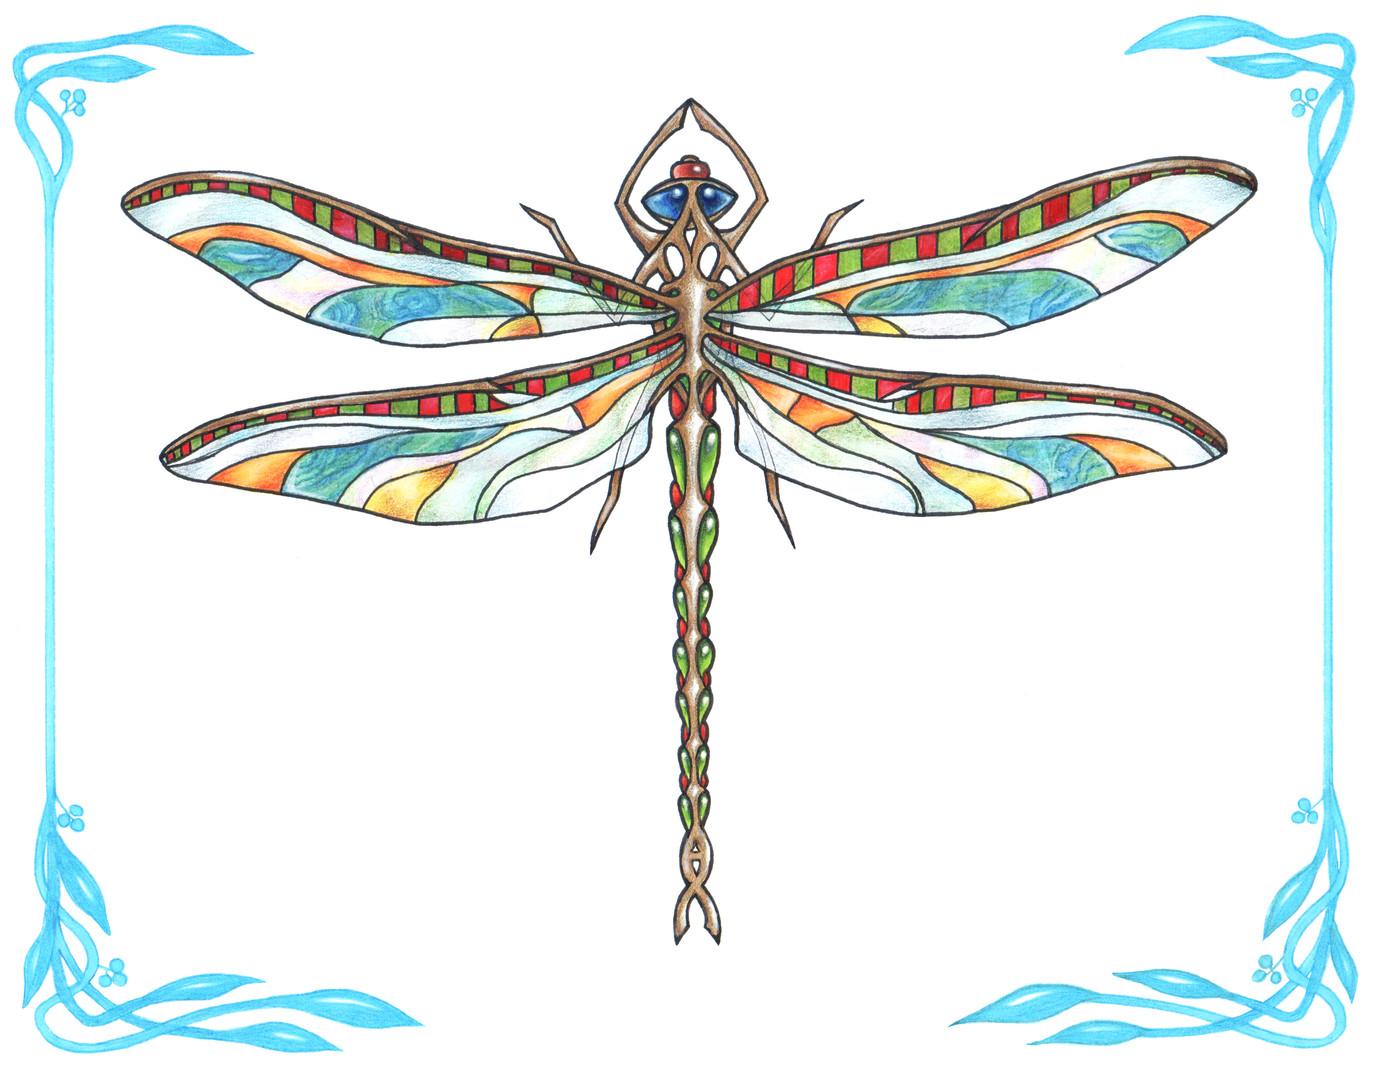 Nouveau Dragonfly illustration